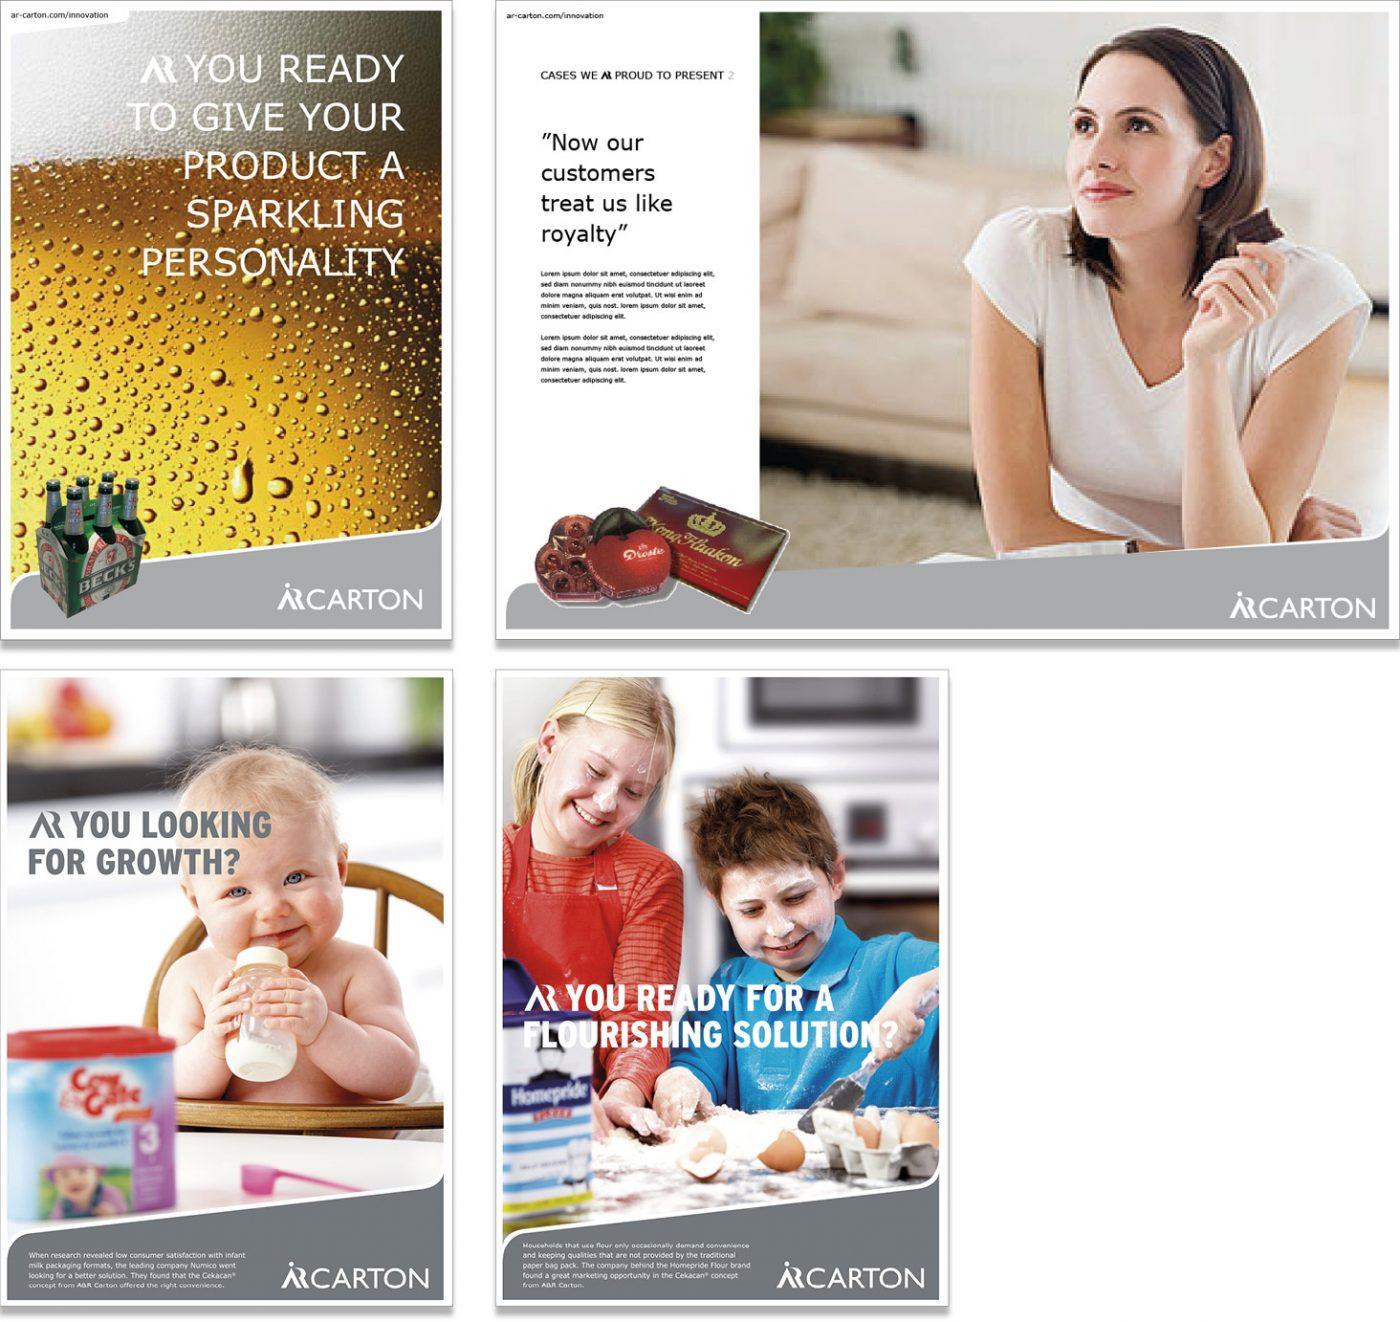 AR Carton Produktkommunikation